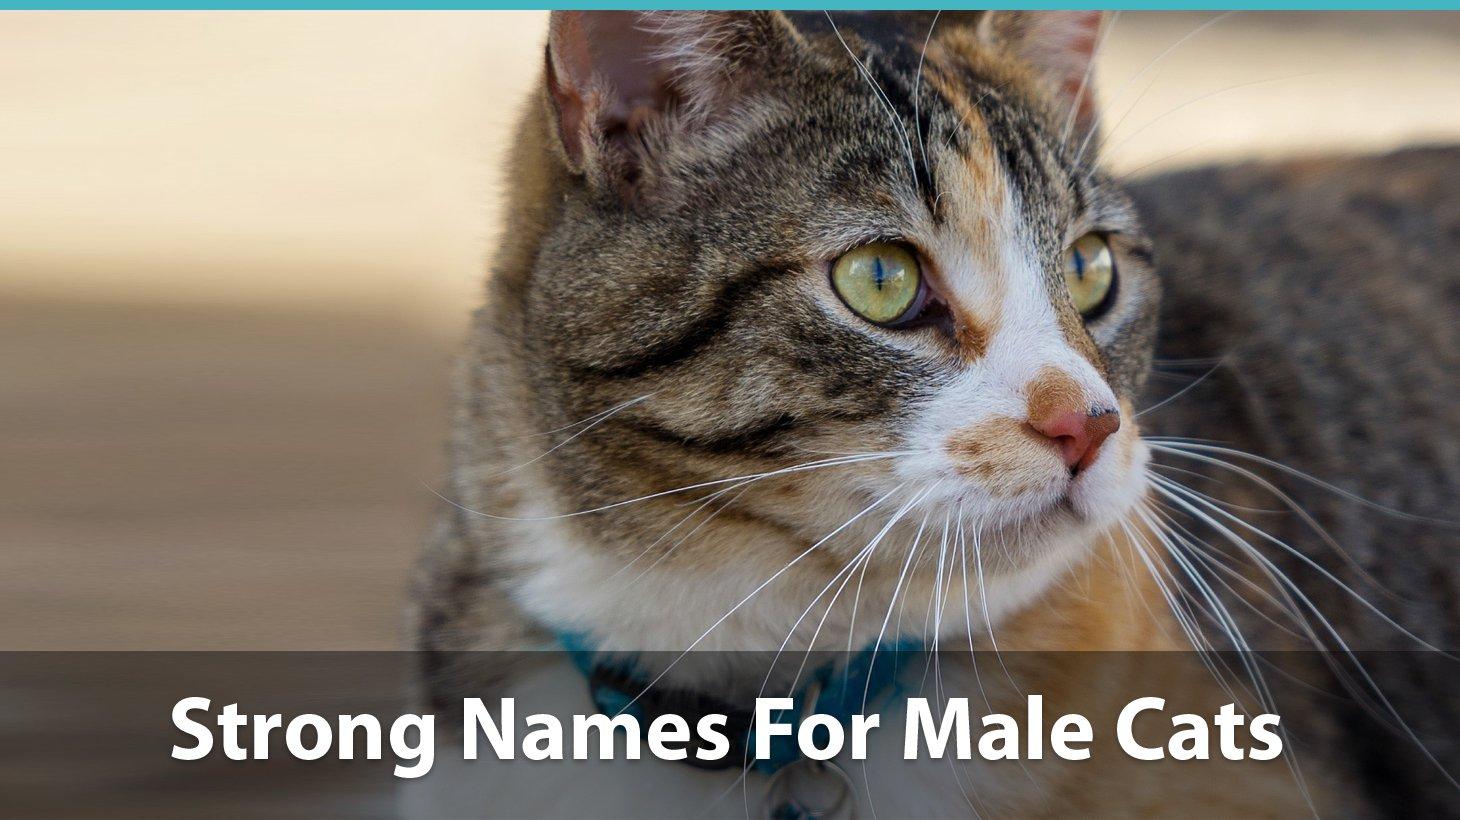 Top 200+ Names For Boy Cats (Cute, Funny, Unique, & Pun Names!)